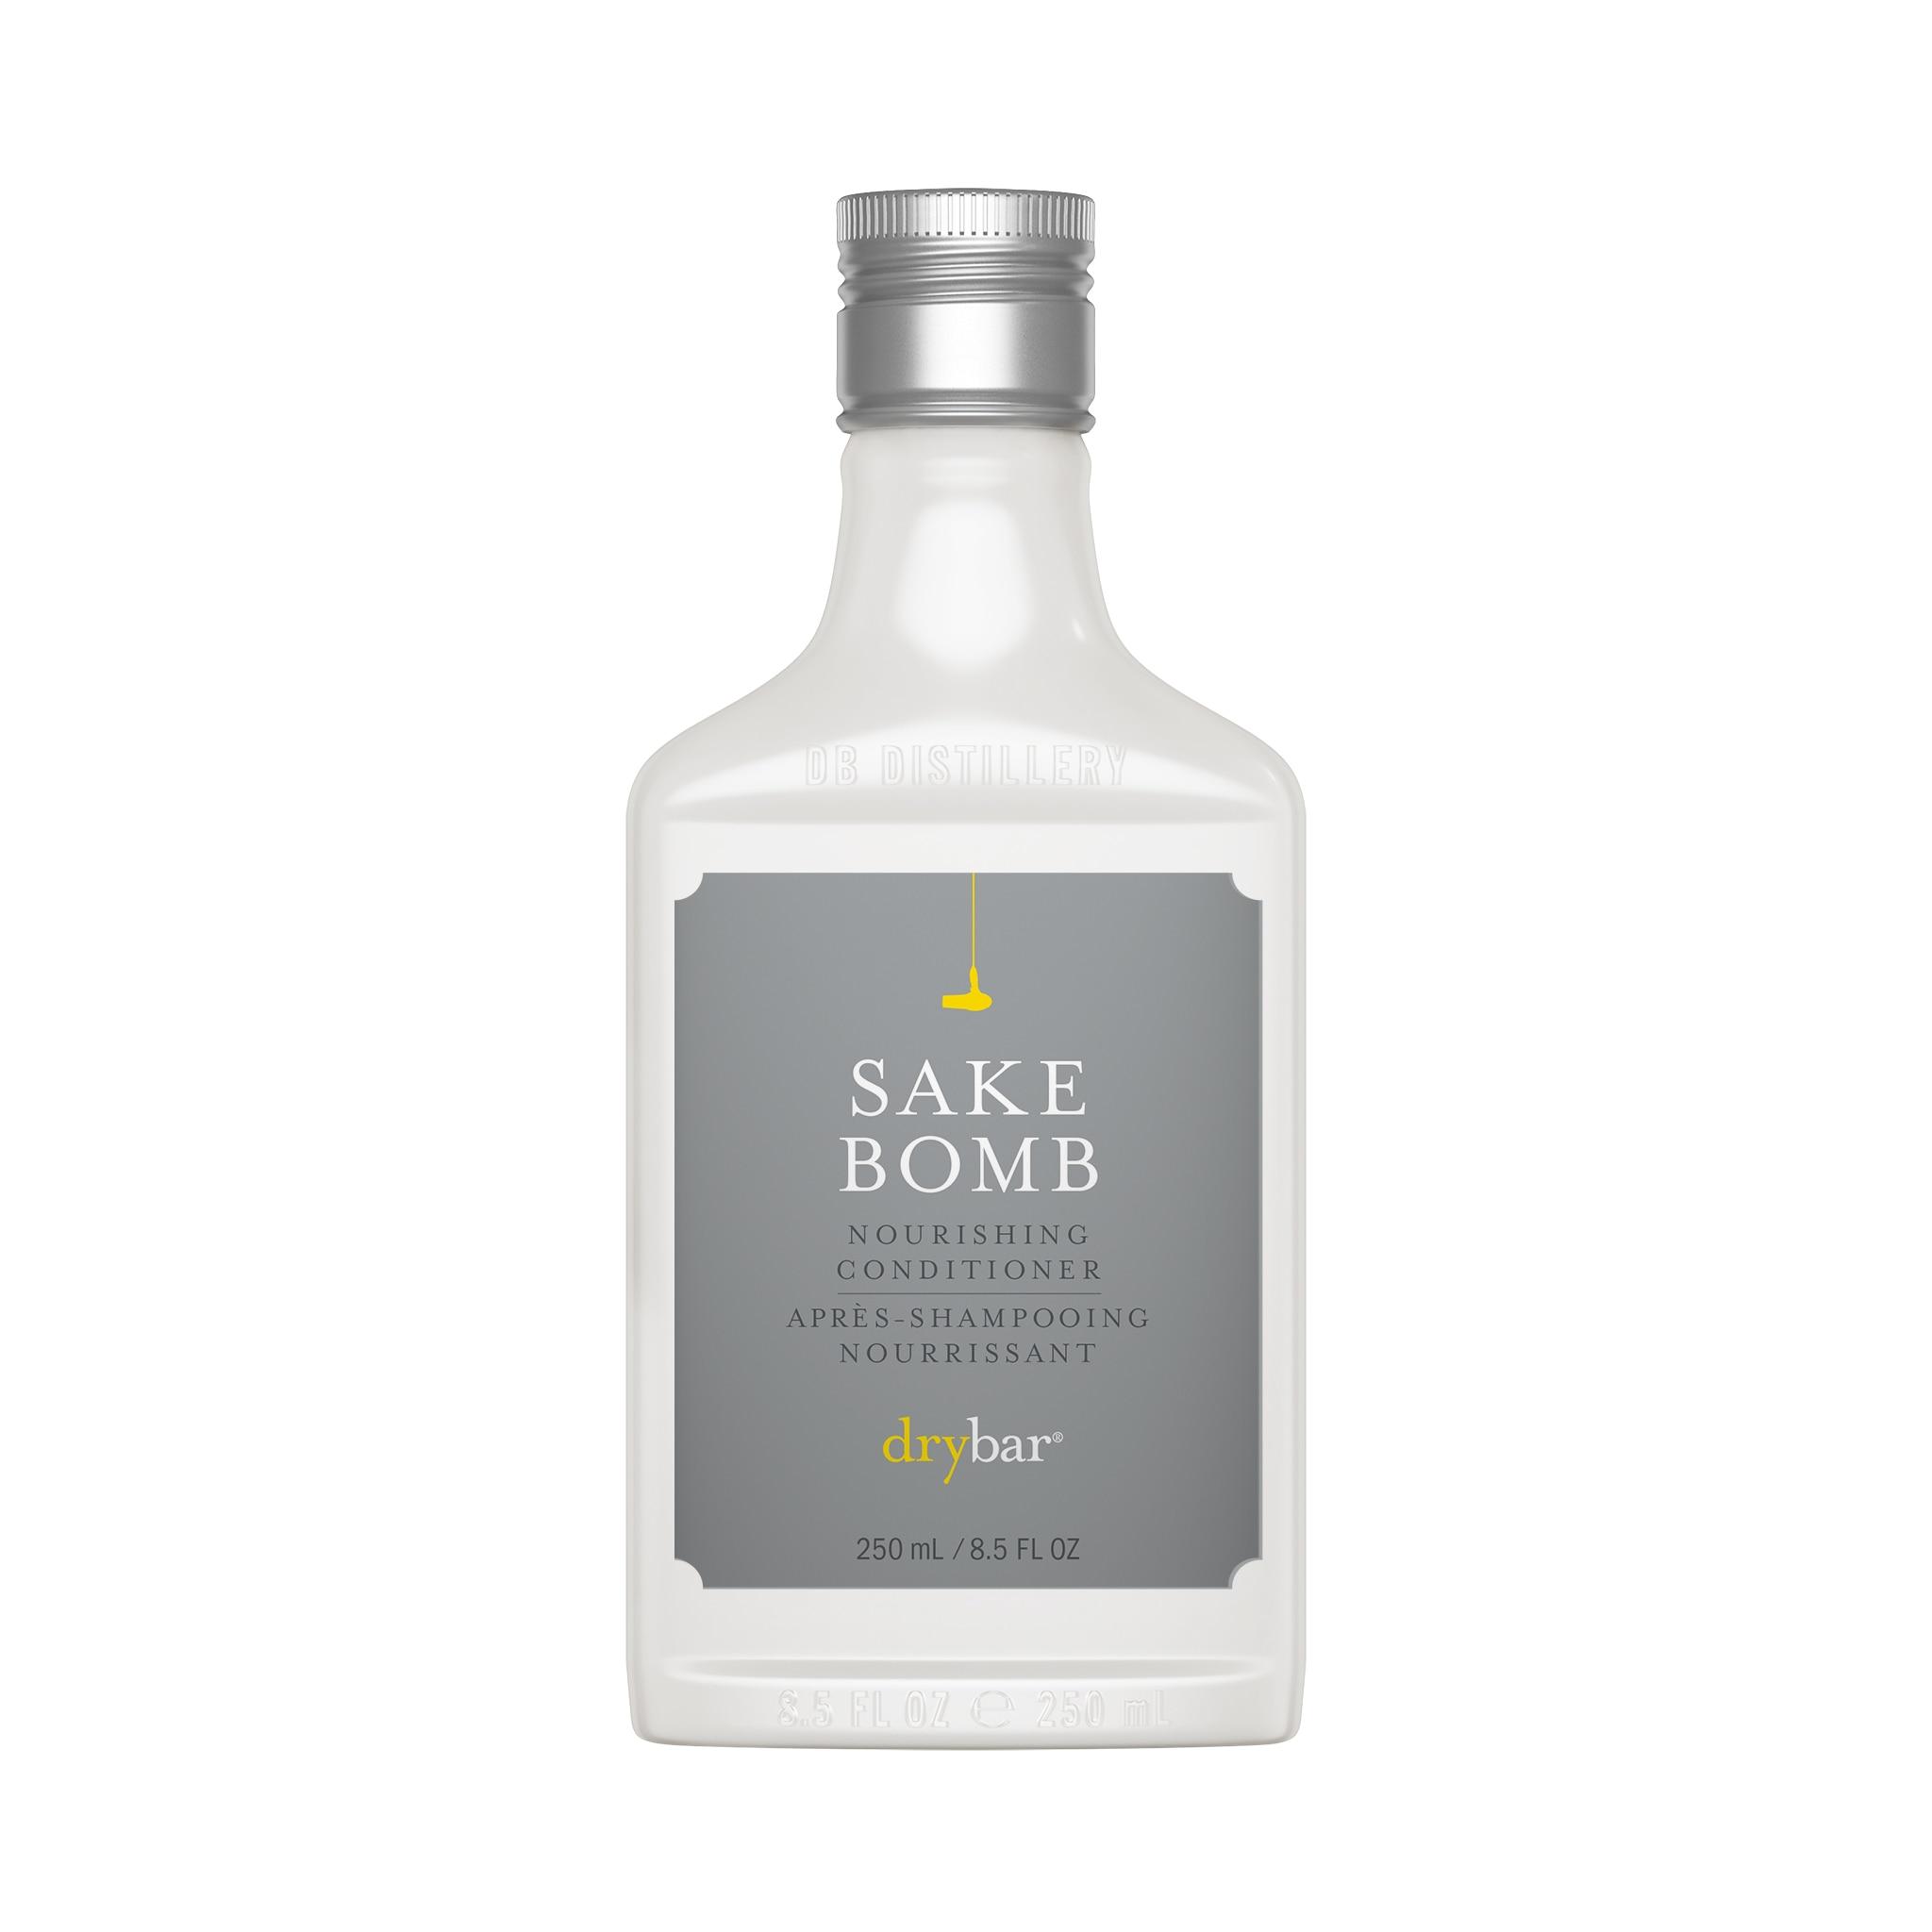 SAKE BOMB CONDITIONER